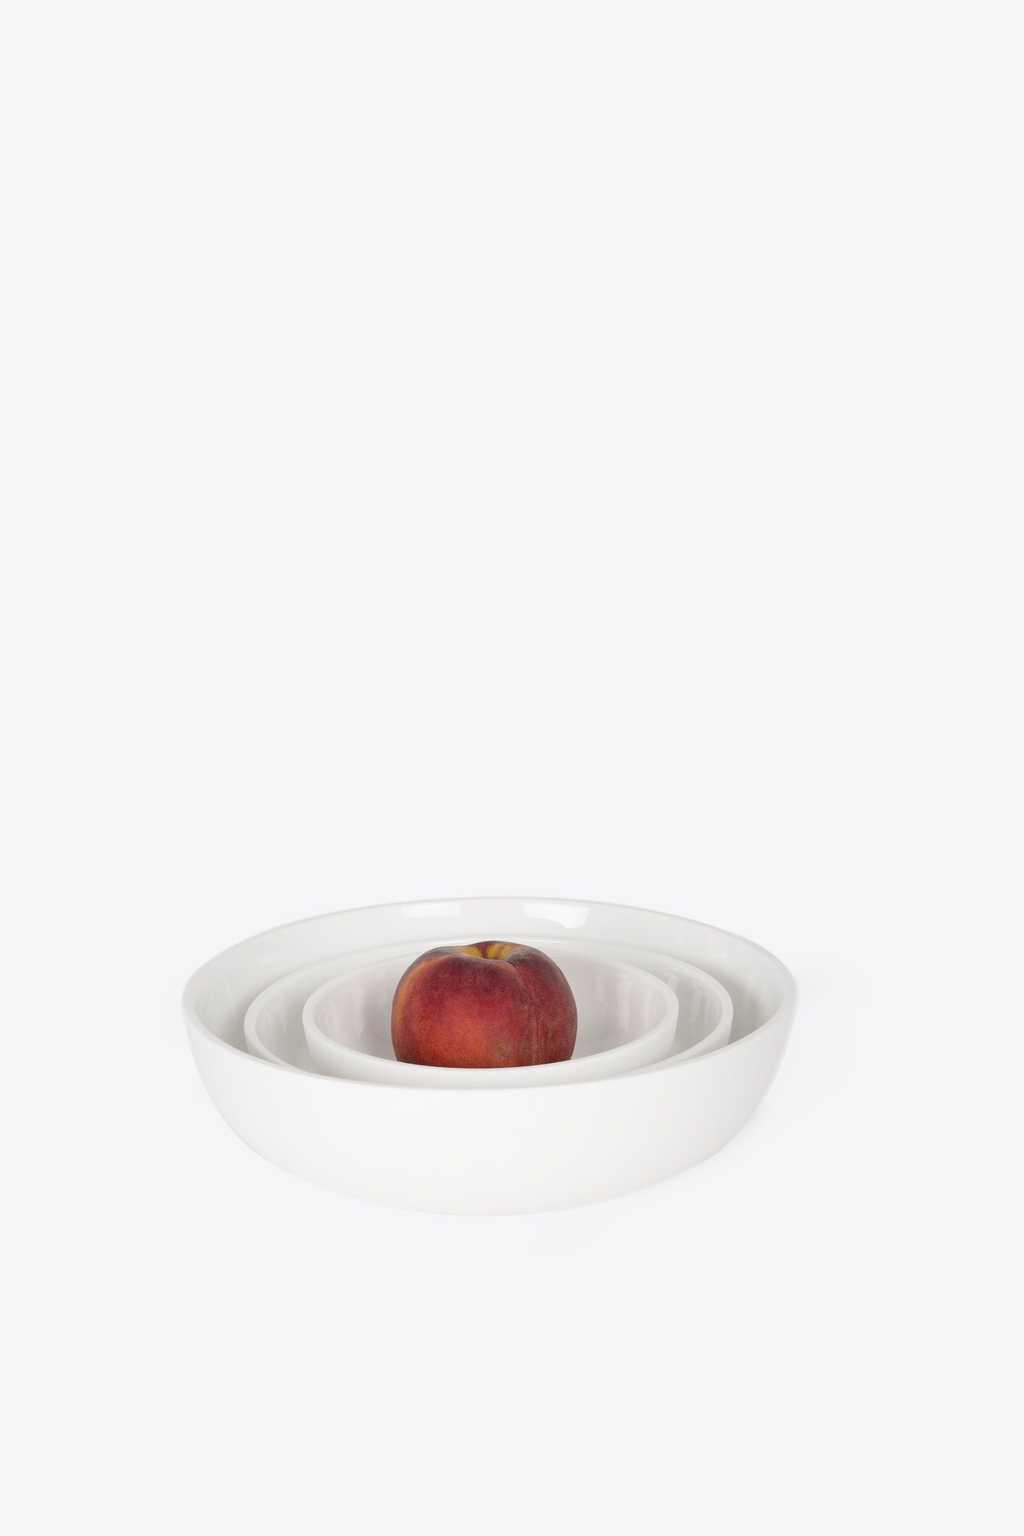 Medium Bowl 1871 White 2